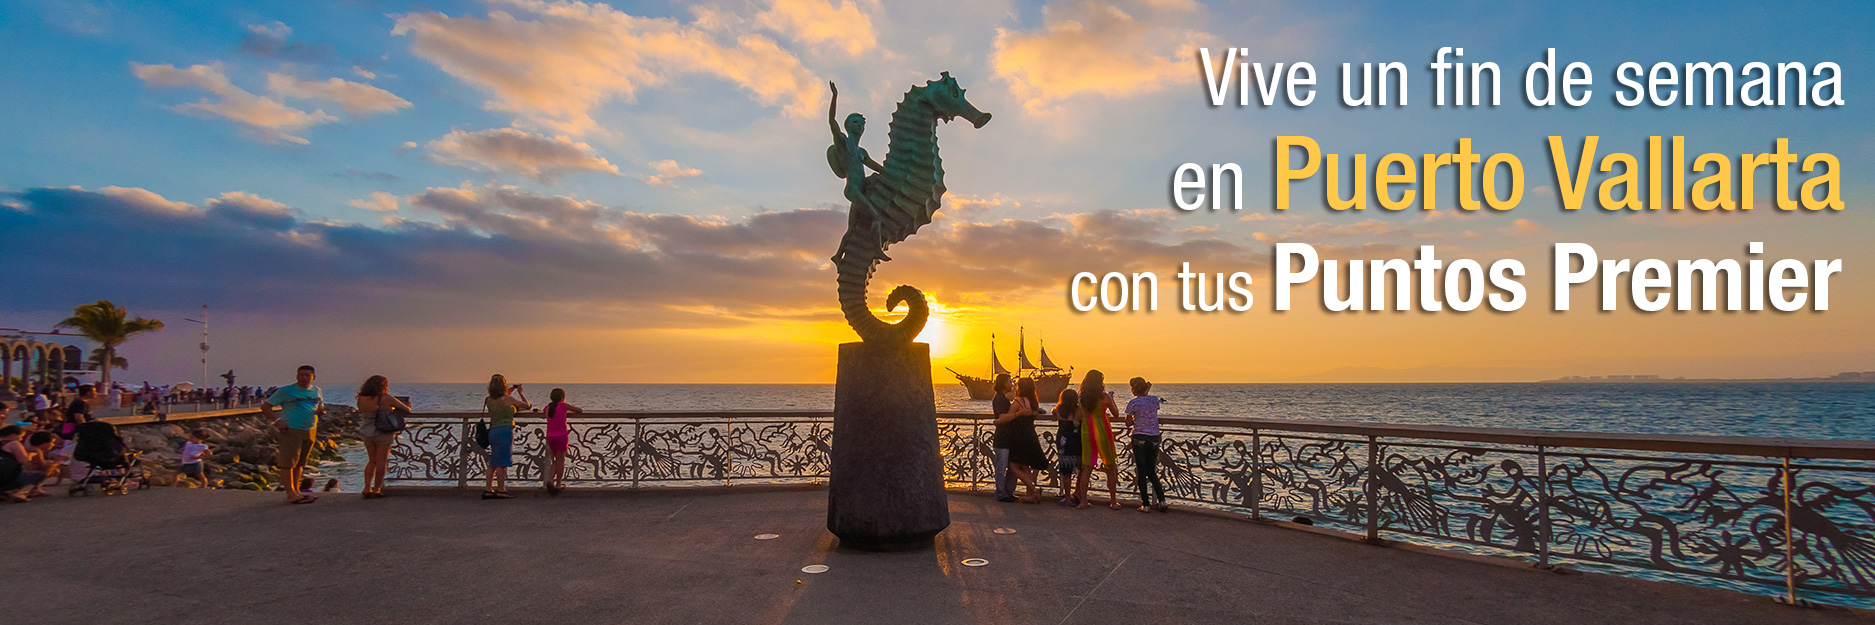 Descansa un fin de semana en Puerto Vallarta